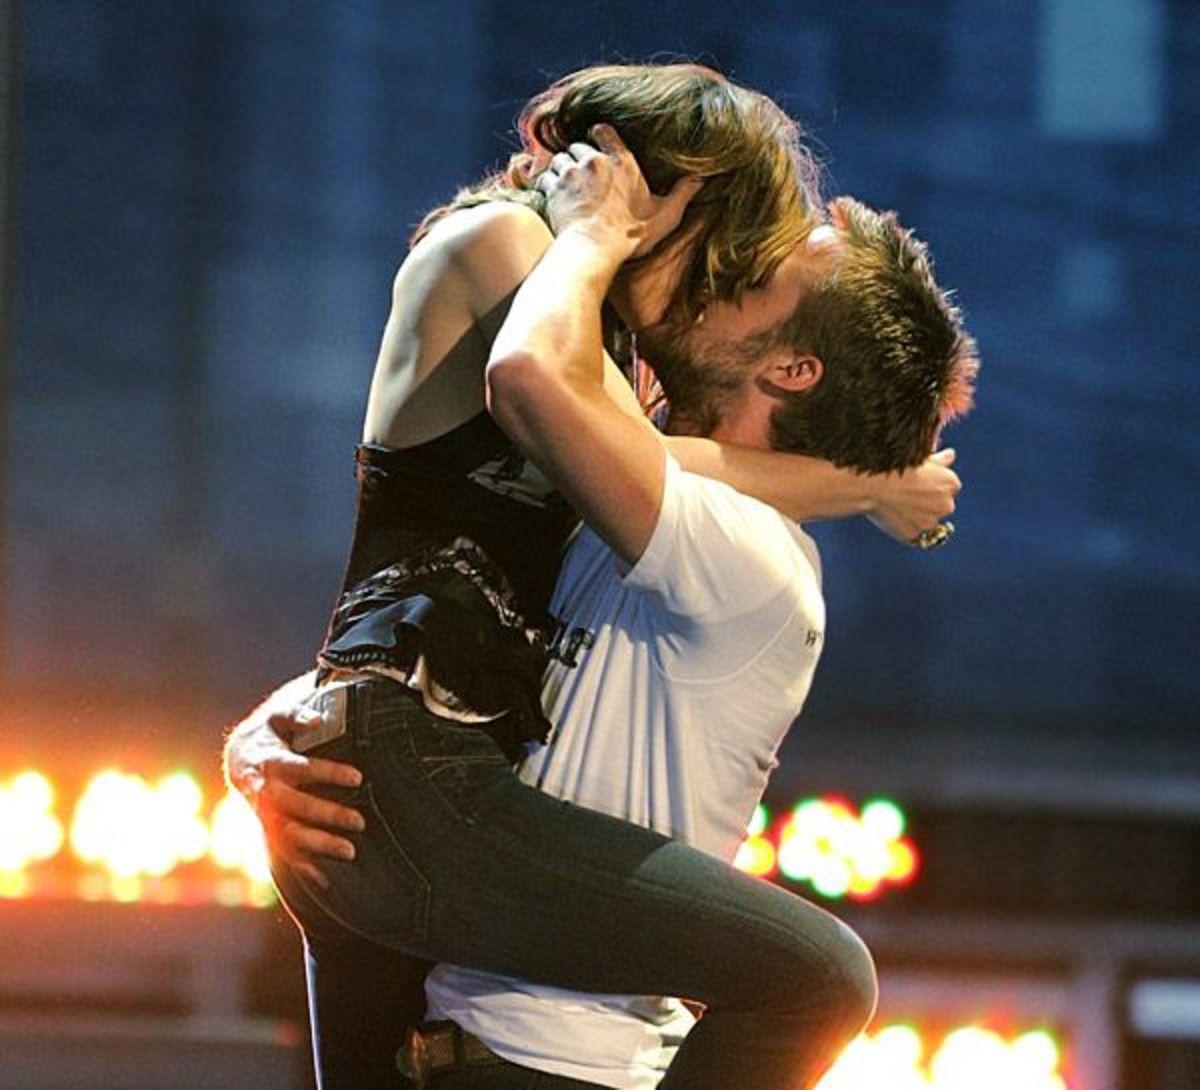 Rachel McAdams & Ryan Gosling recreating their iconic kiss at the MTV Movie Awards.